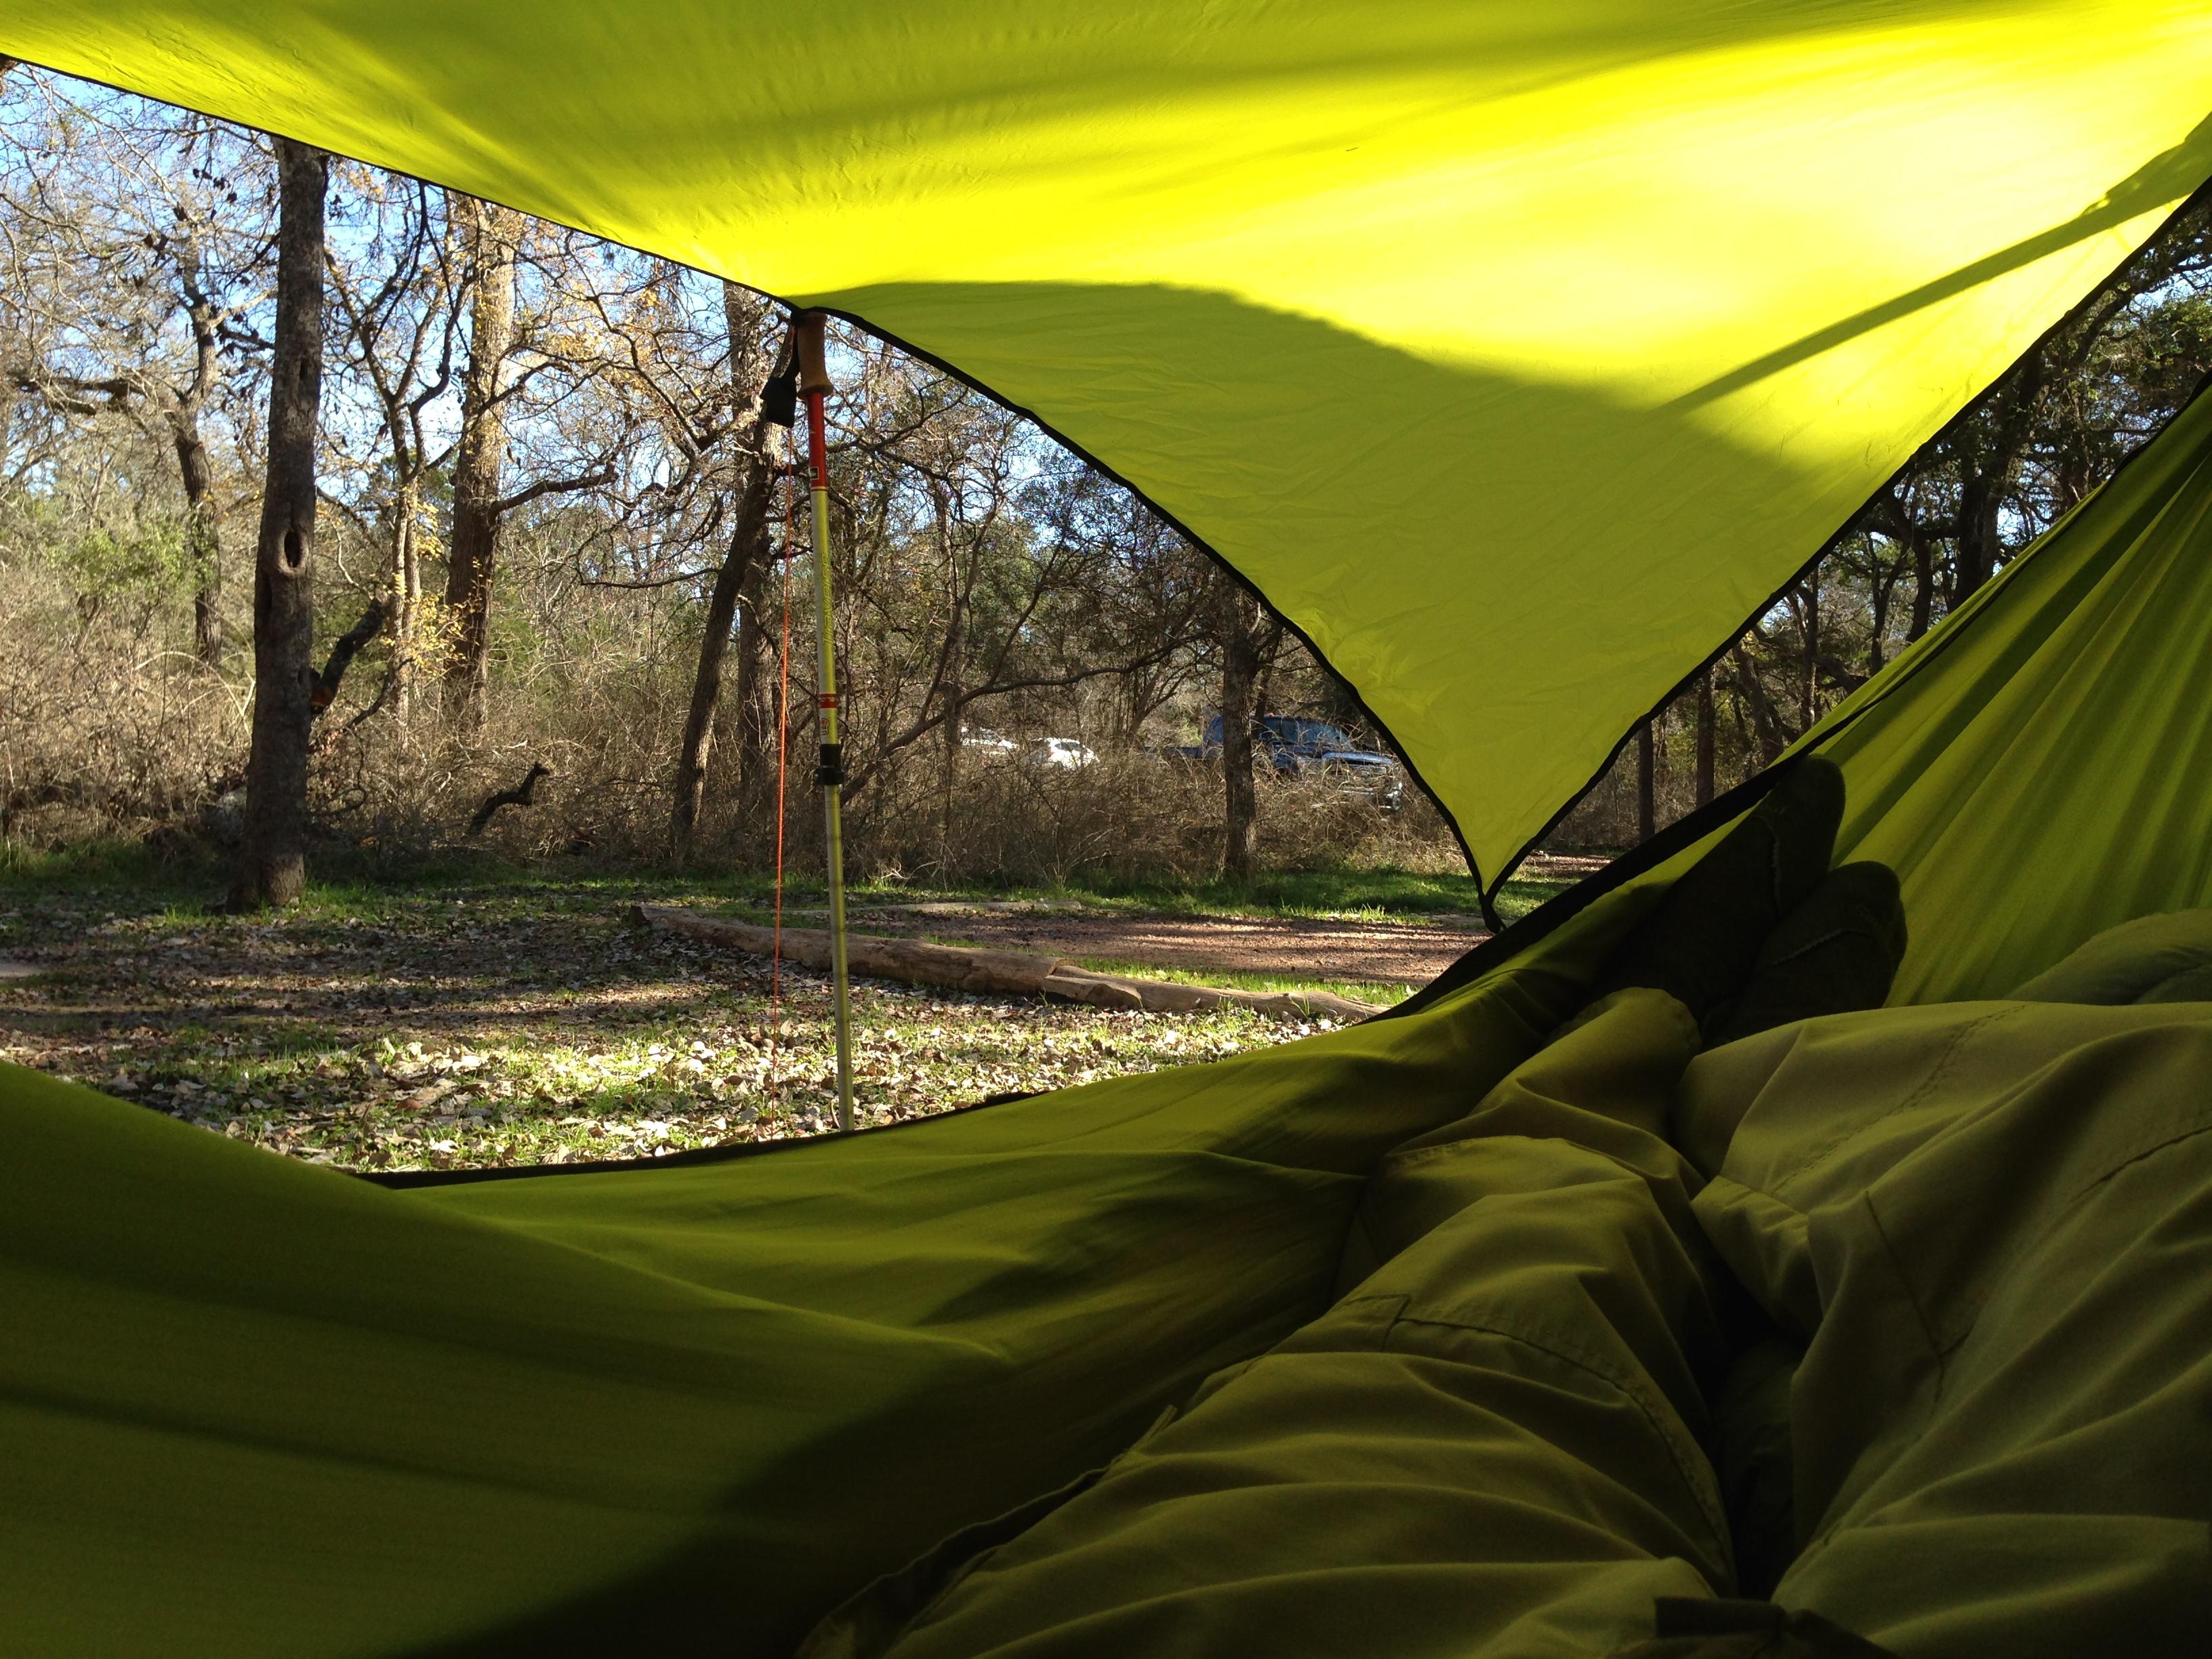 tree hangers cfm of set product straps hugger inuse hayneedle hammock